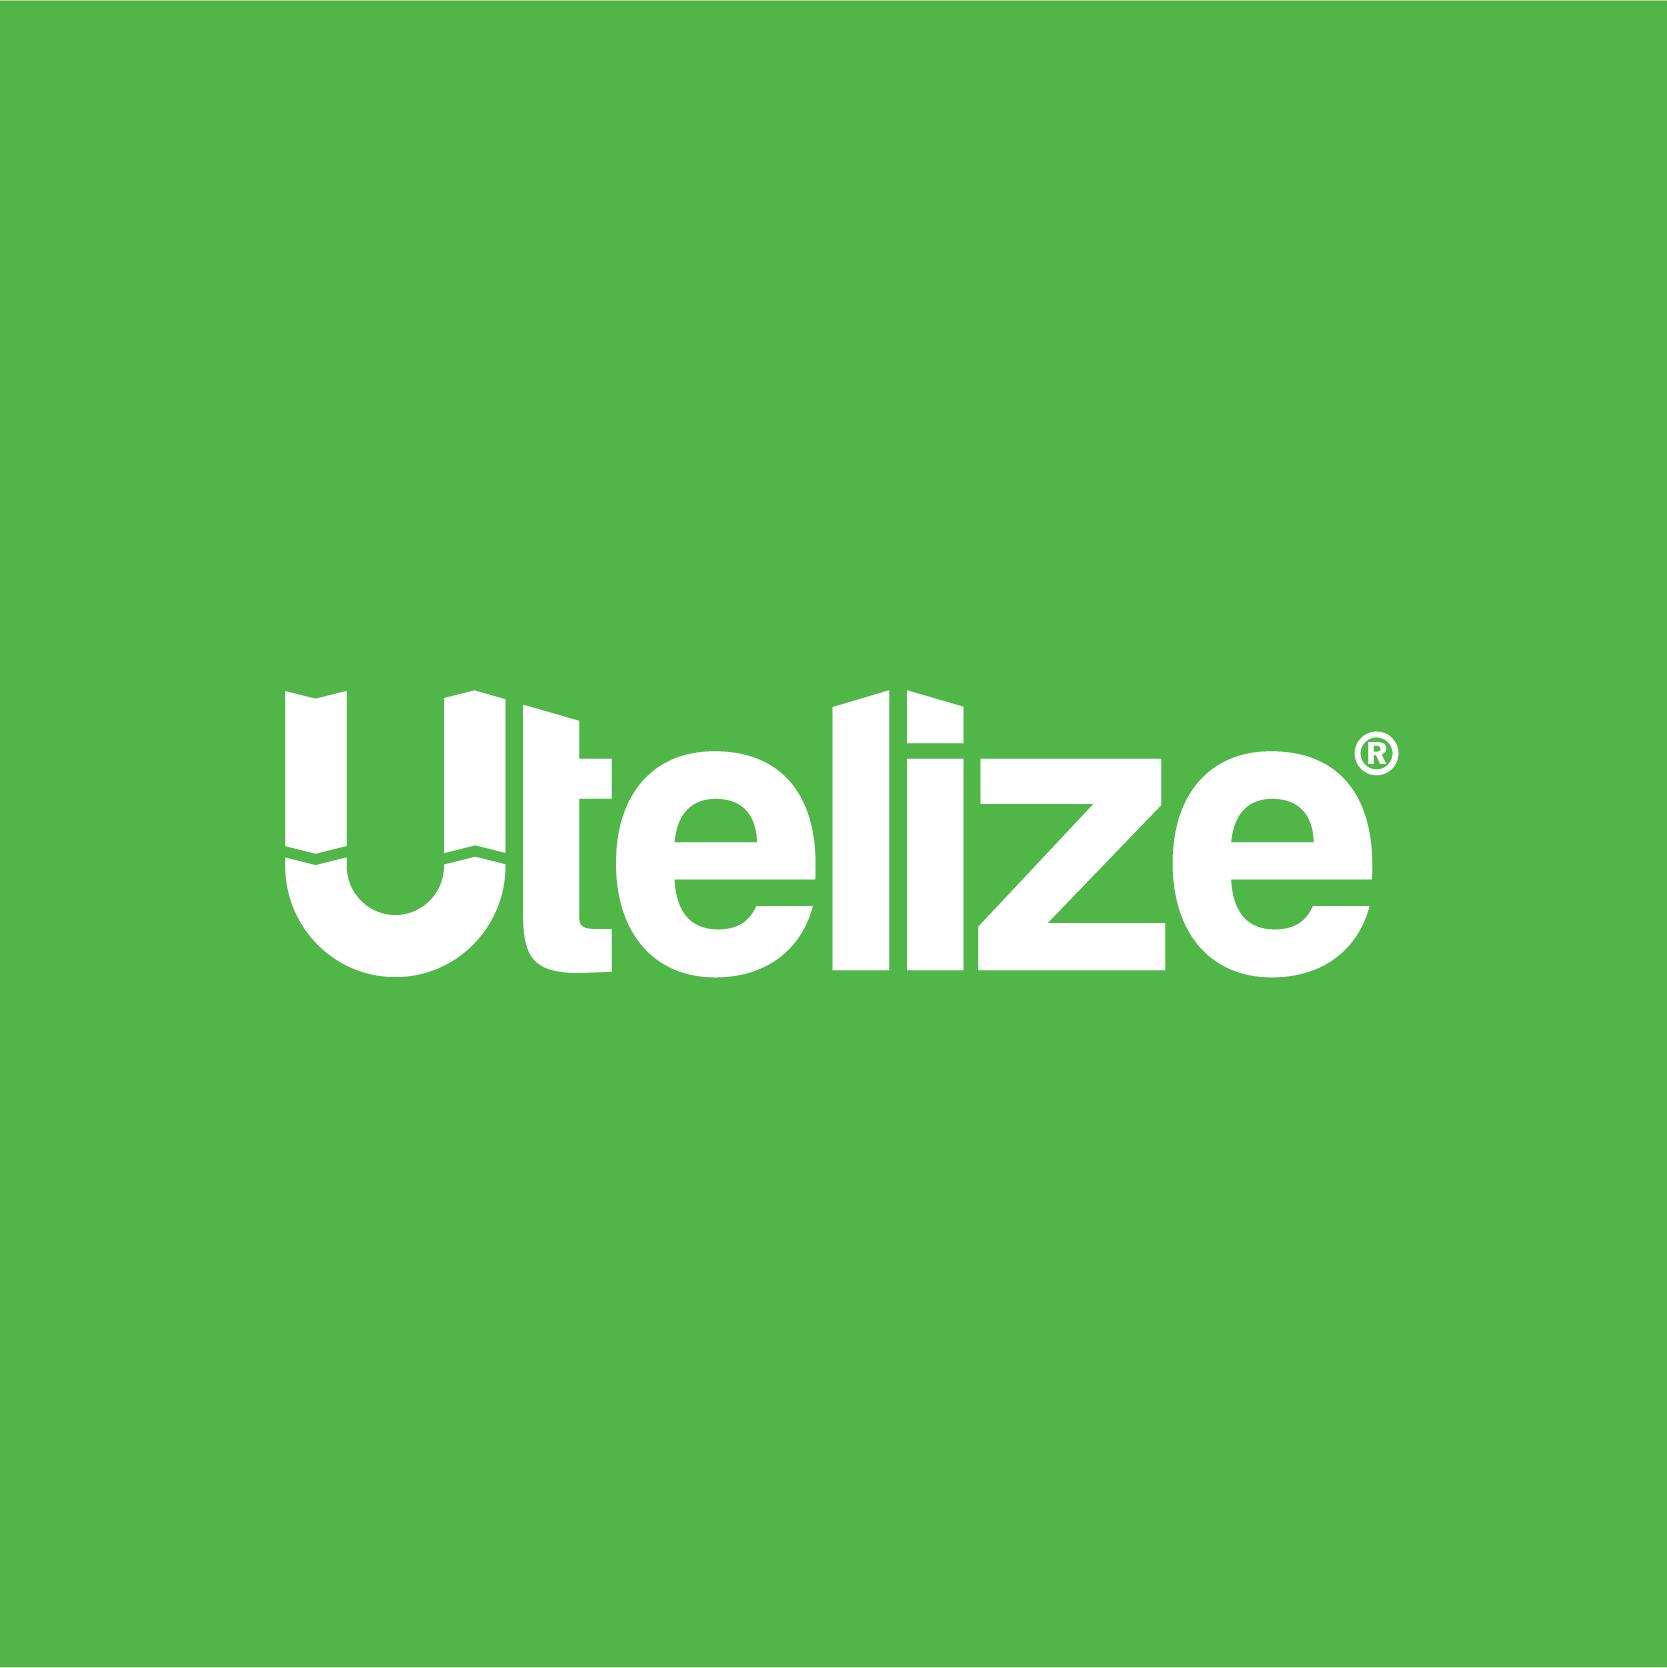 Utelize Logo